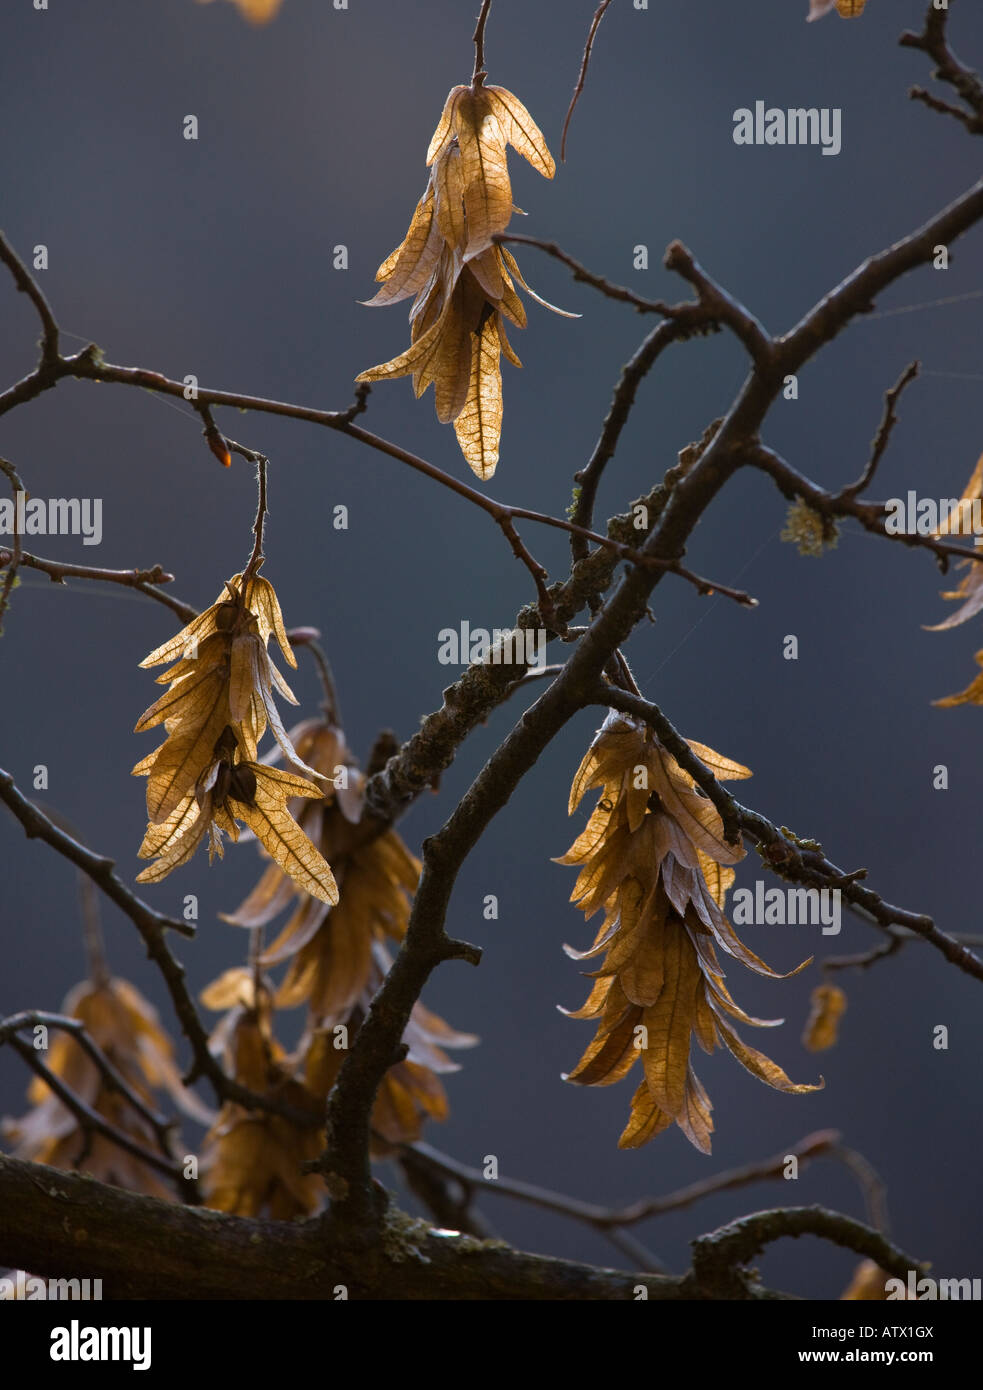 carpinus betulus stockfotos carpinus betulus bilder alamy. Black Bedroom Furniture Sets. Home Design Ideas